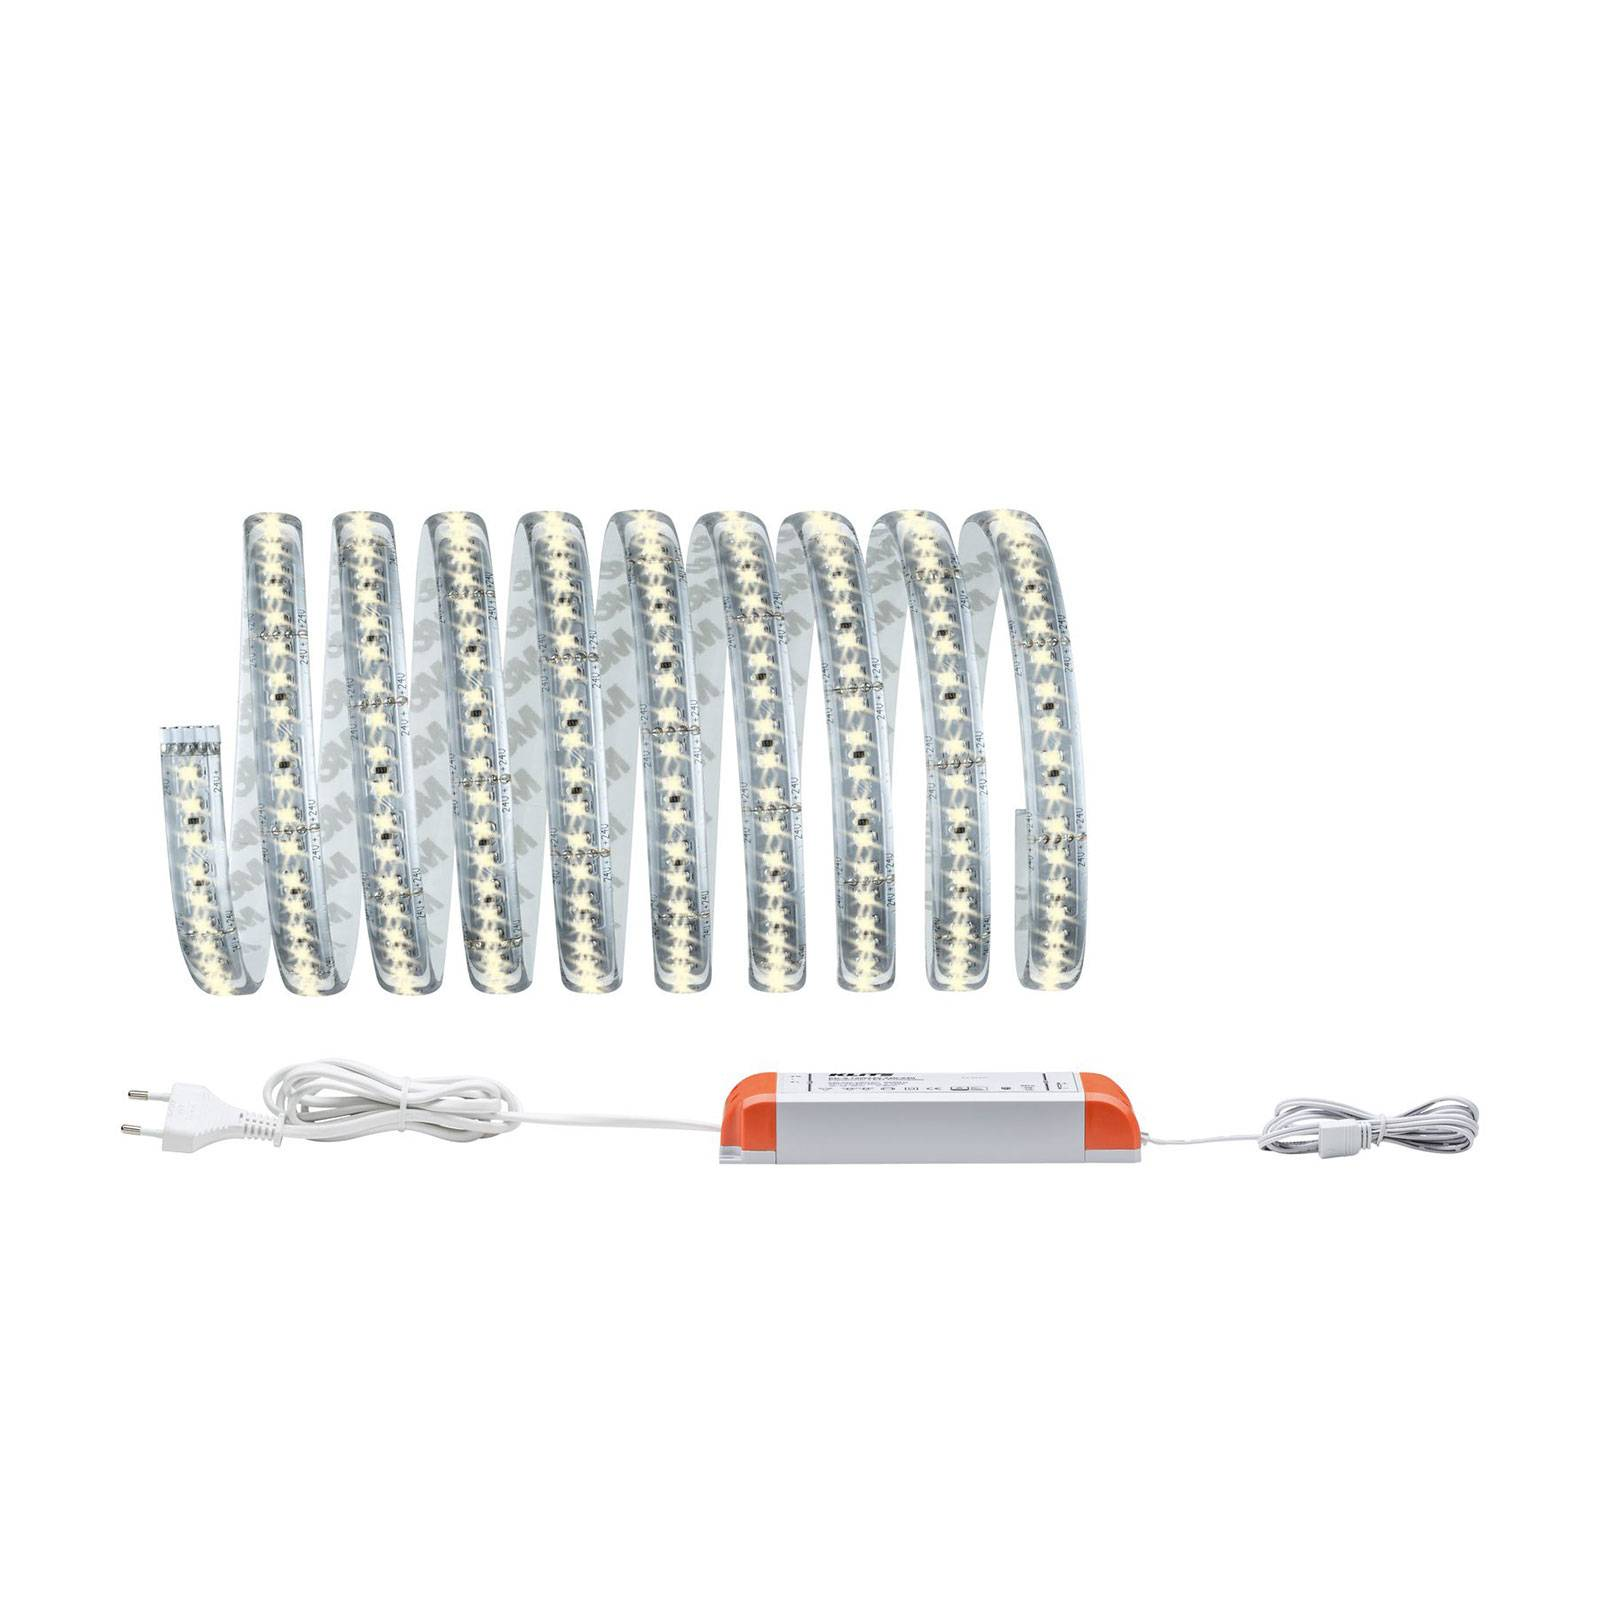 Paulmann MaxLED 1000 perussarja LED-Strip 3m,2700K